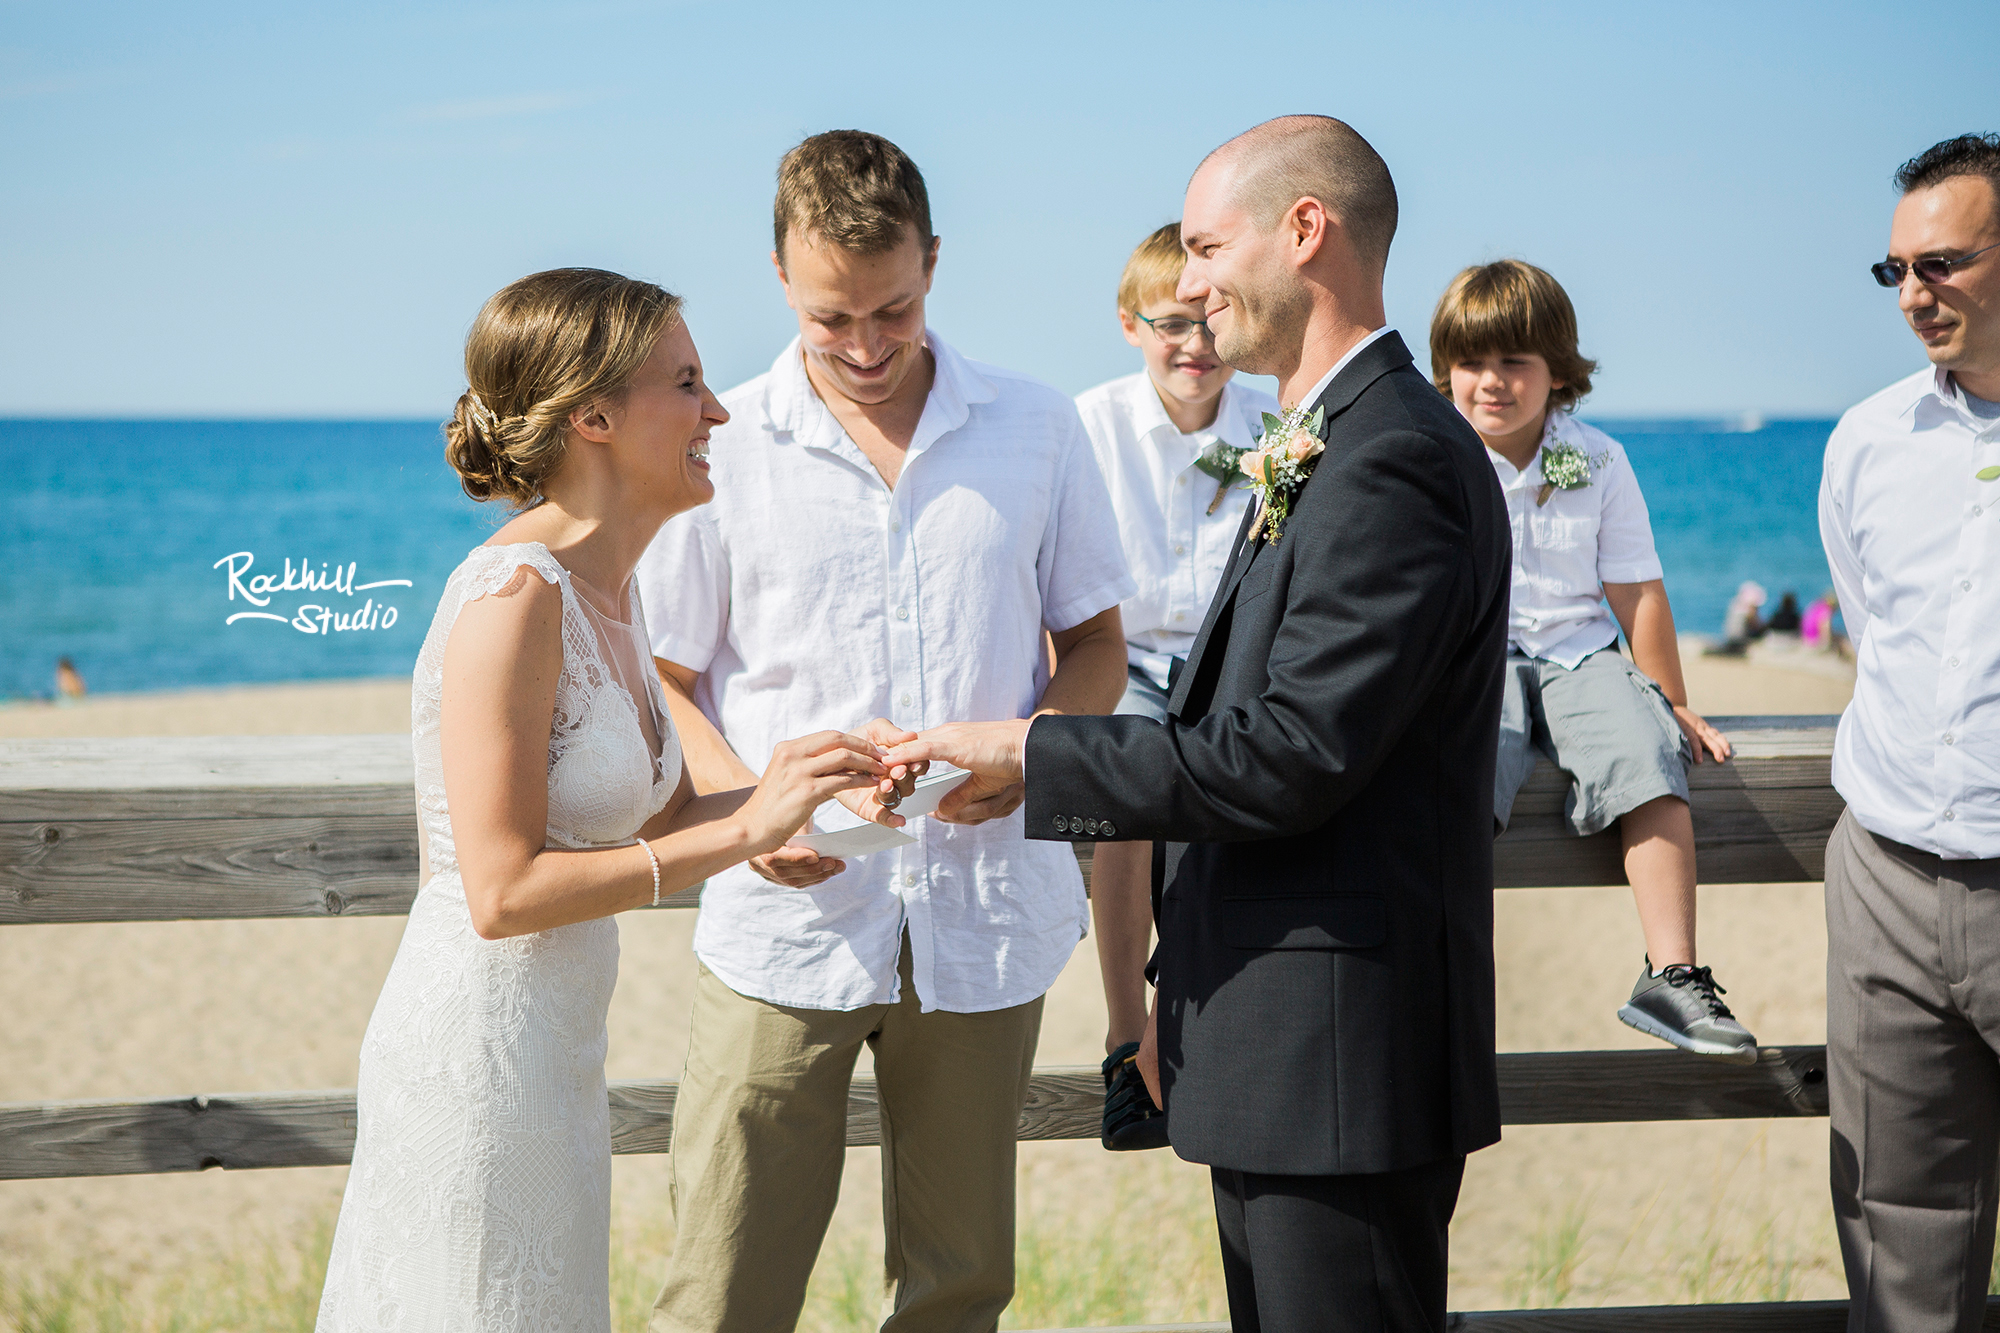 grand-marais-wedding-photography-upper-peninsula-northern-michigan-rockhill-36.jpg